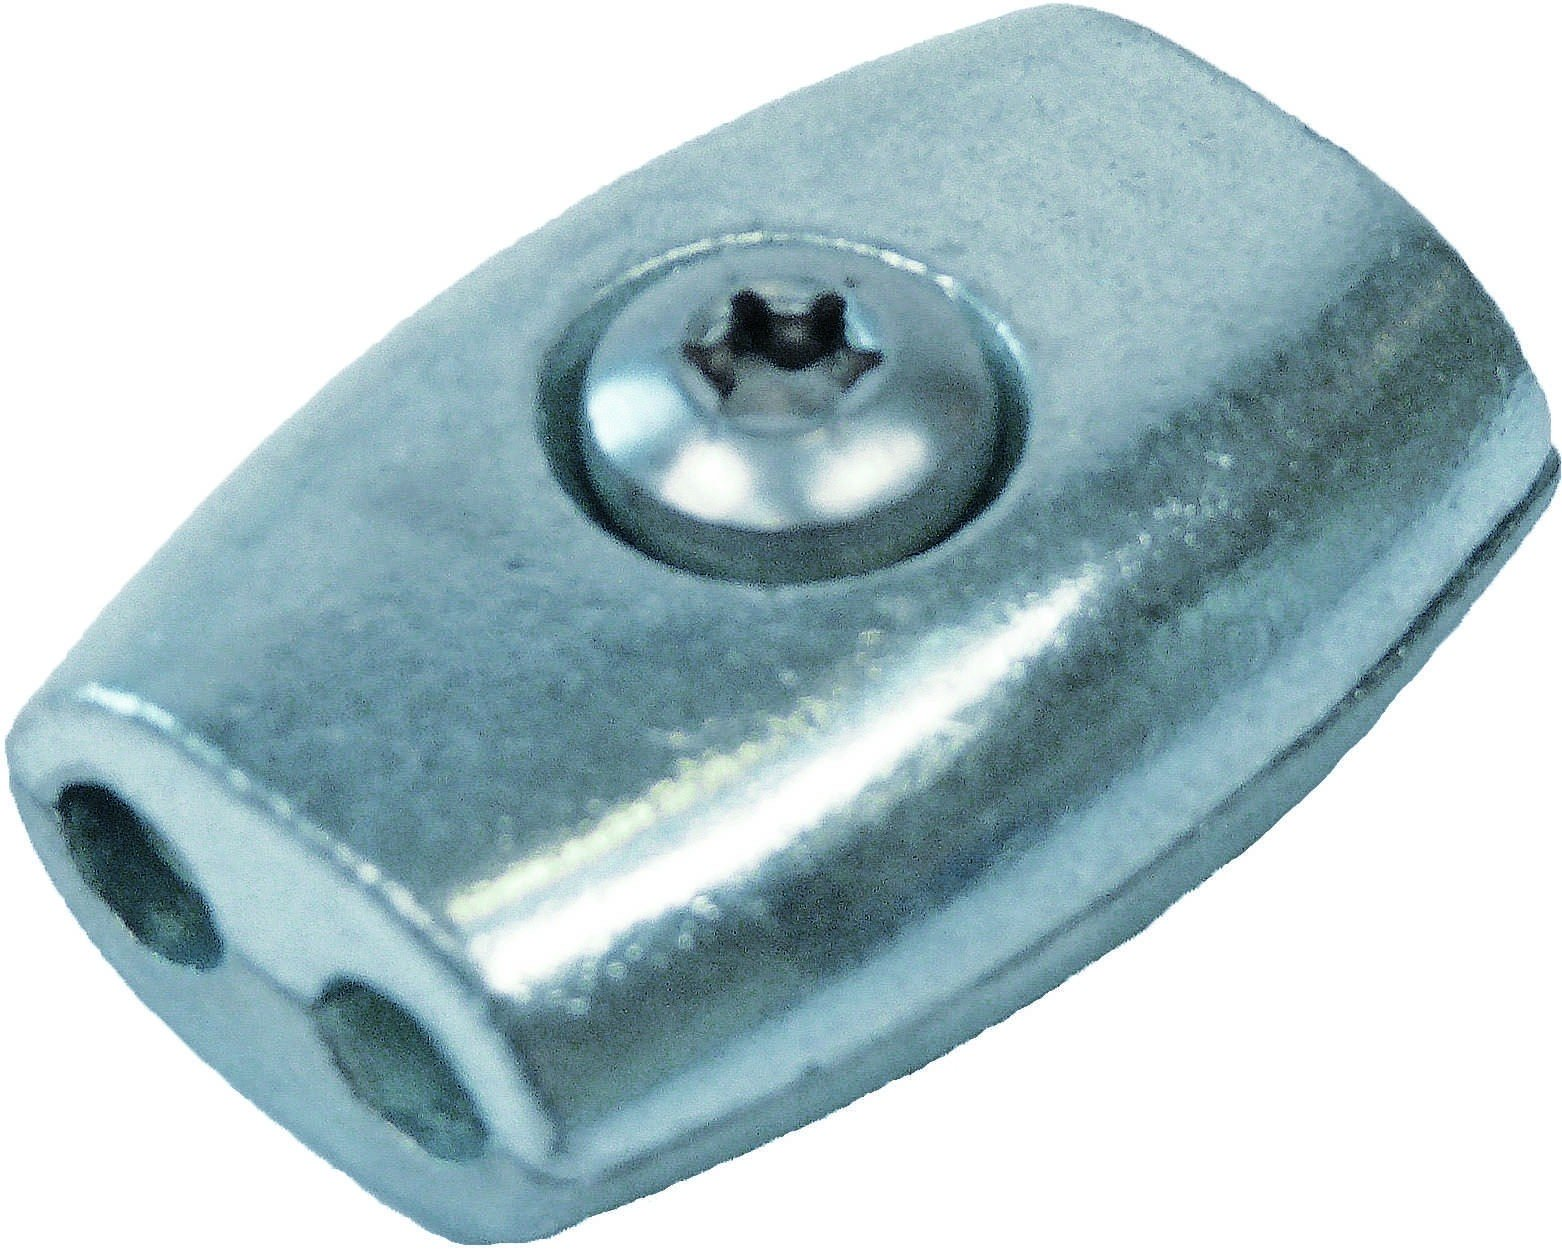 Staaldraadklem eivormig 5mm RVS A4 1 stuks